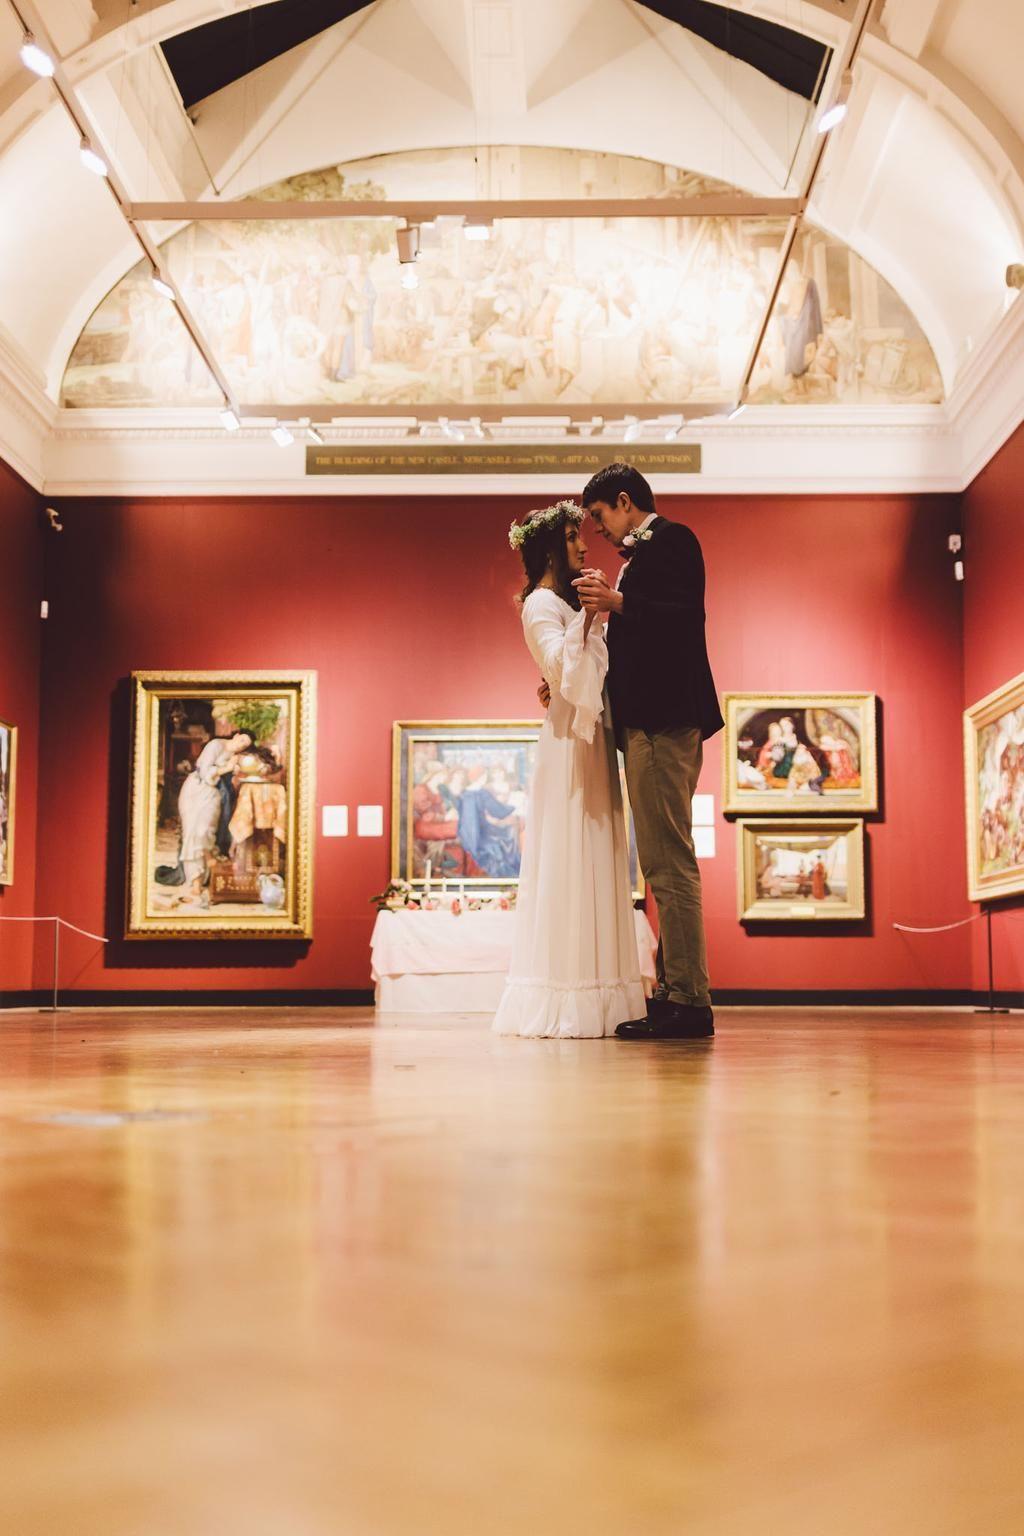 Barryforshawphoto Barryforshawpho Twitter Wedding Portraits Inspiration Art Gallery